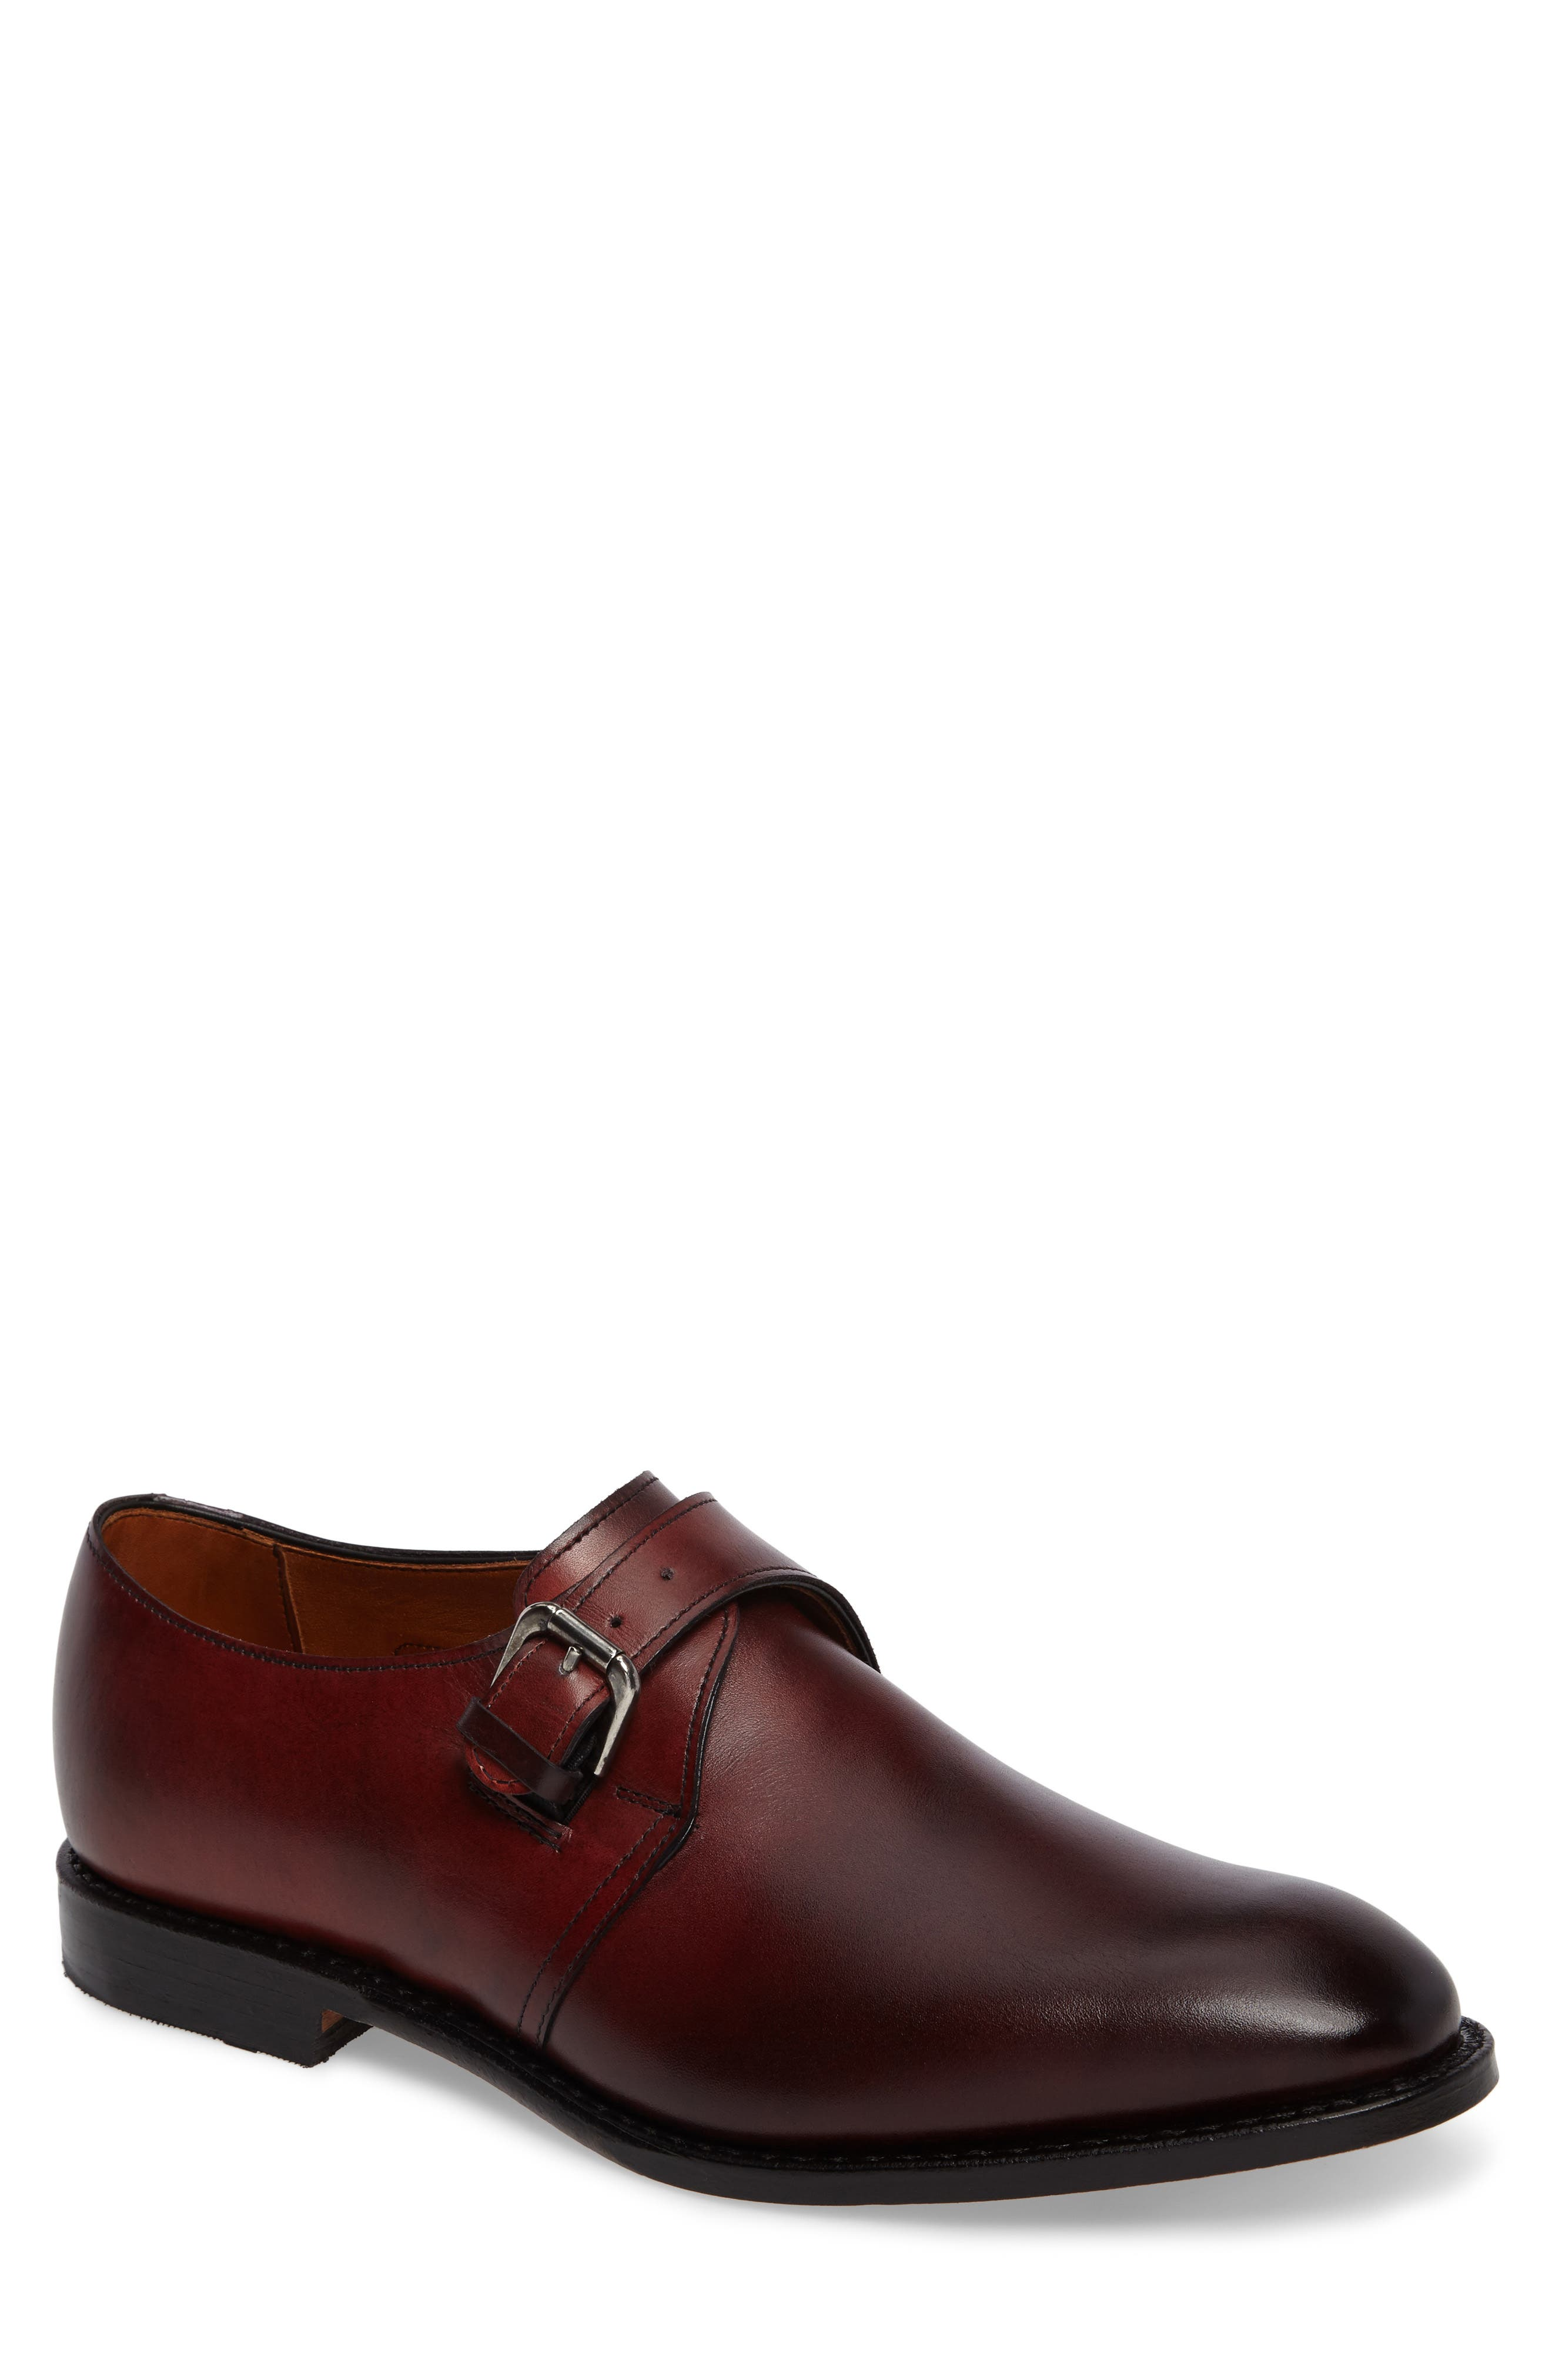 Warwick Monk Strap Shoe,                         Main,                         color, Oxblood Leather